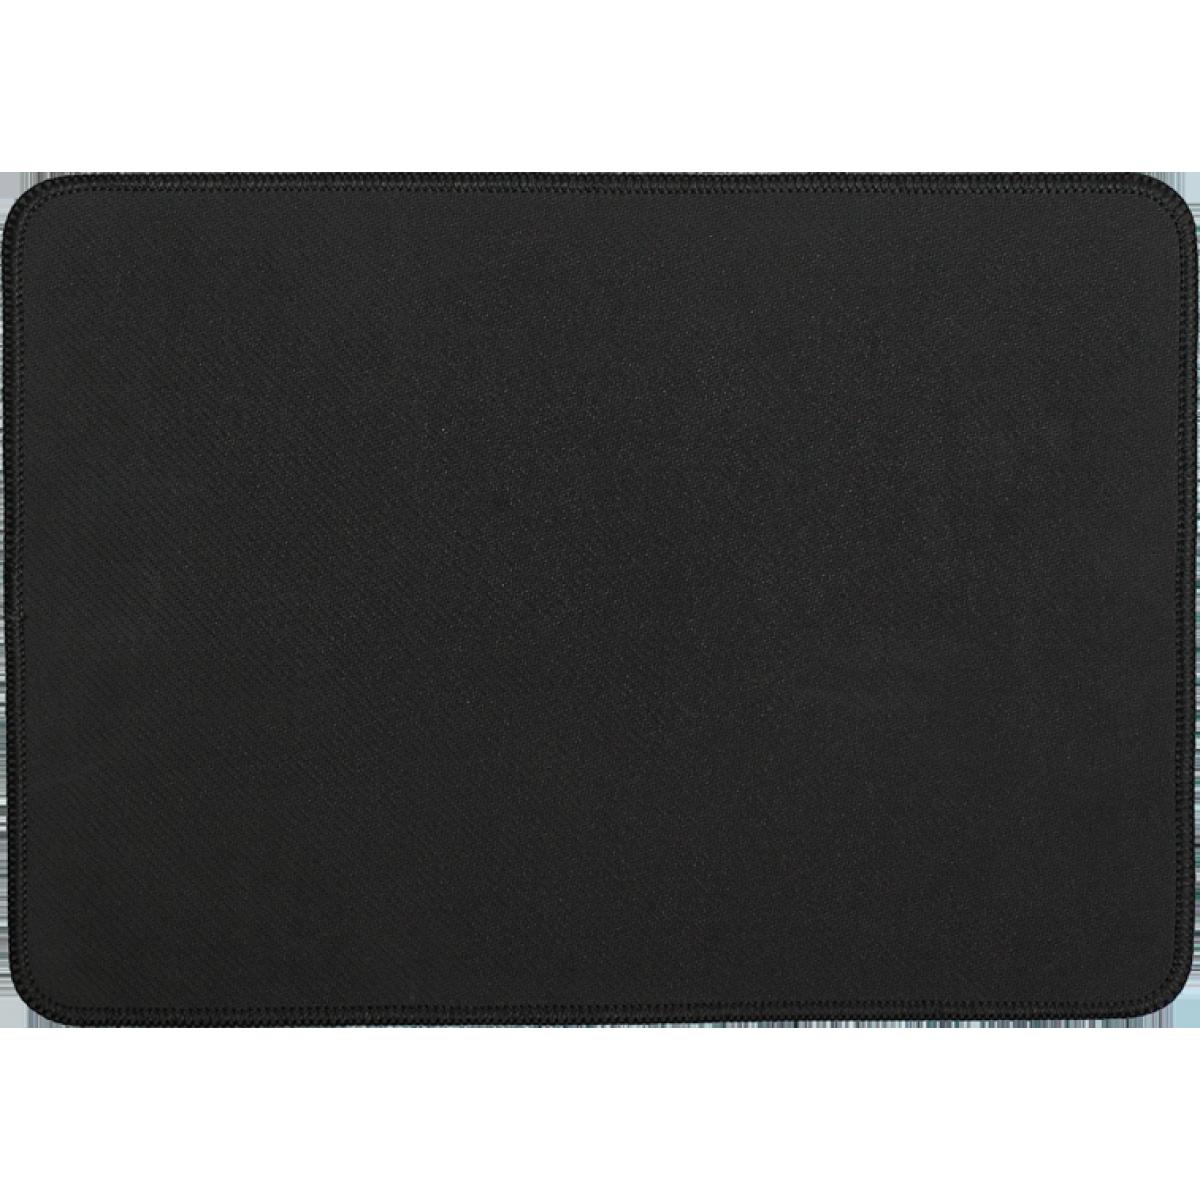 Mousepad Gamer Riotoro, Vyron Multi Bull, Grande, Black, MPAD-MB-S